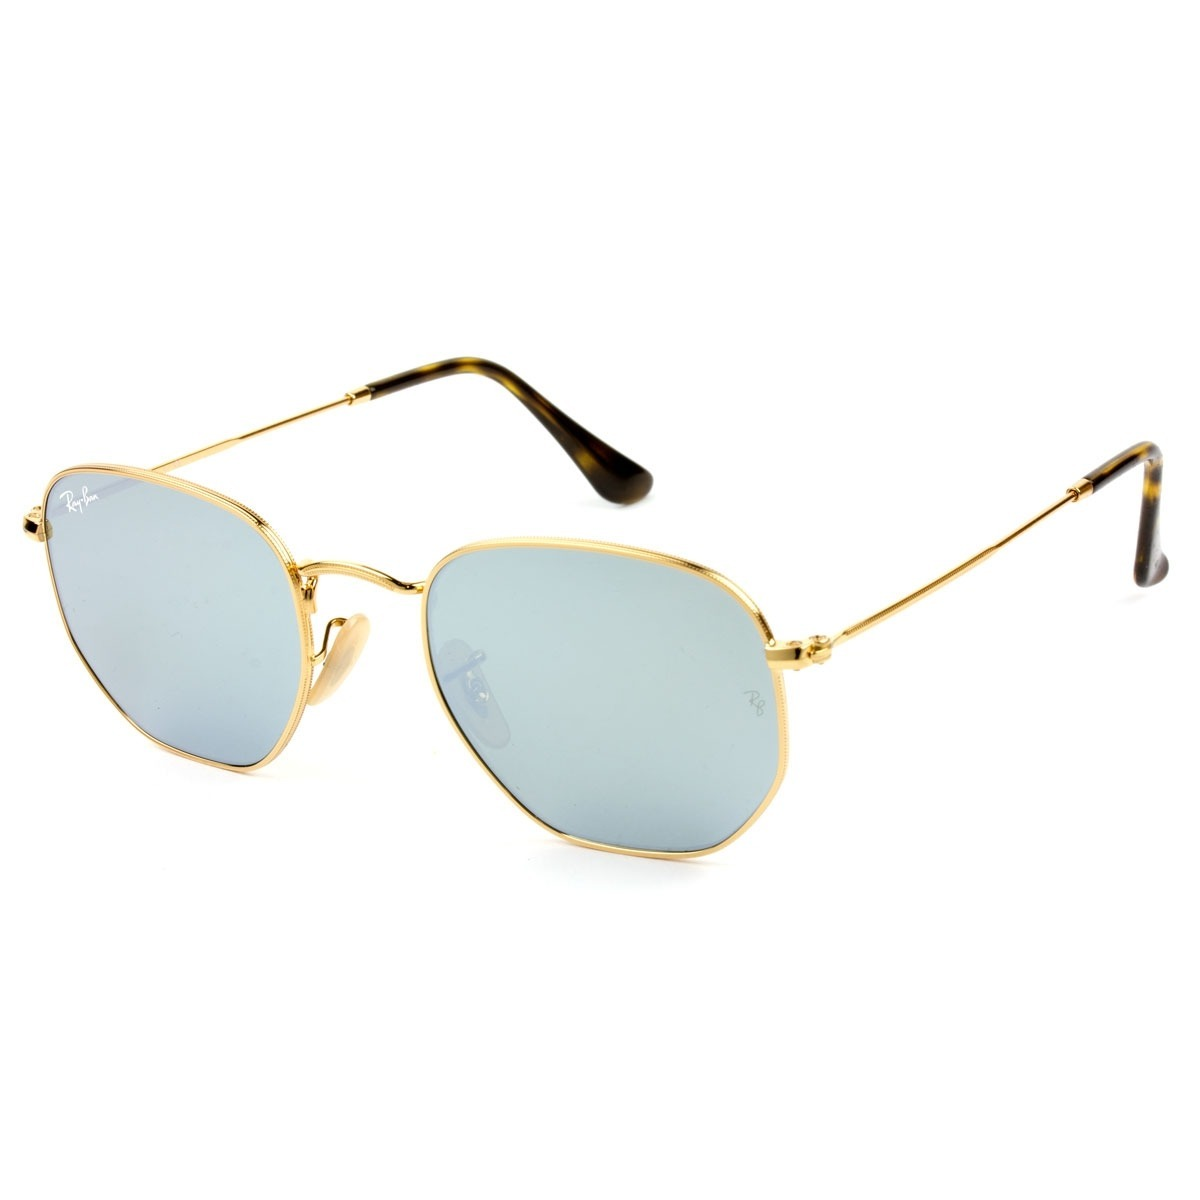 254a2914fa7fe óculos de sol hexagonal ray ban rb 3548n 001 30 tam 51. Carregando zoom... óculos  sol ray ban. Carregando zoom.